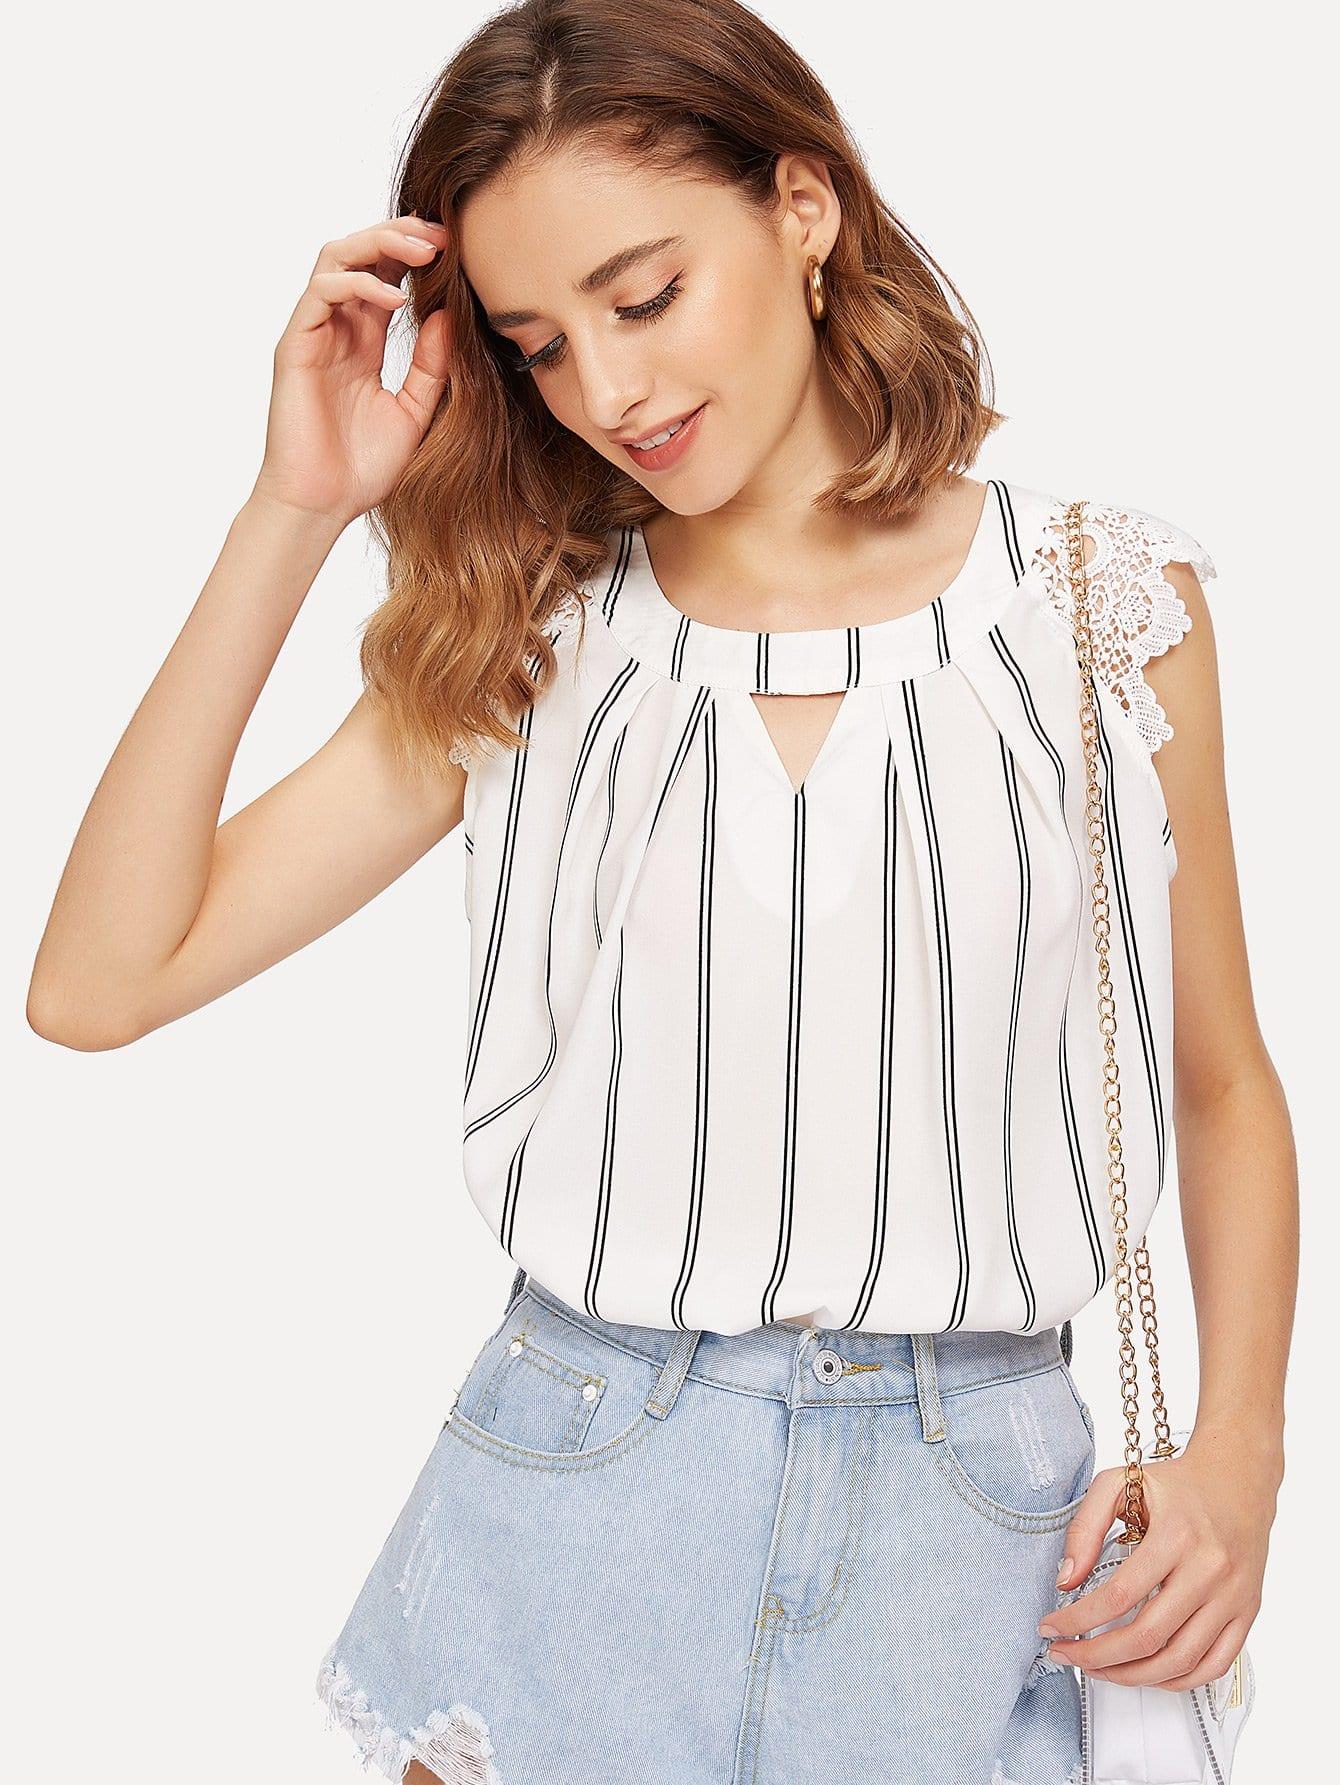 Lace Shoulder Cutout Pleated Neck Striped Top pink shoulder cutout